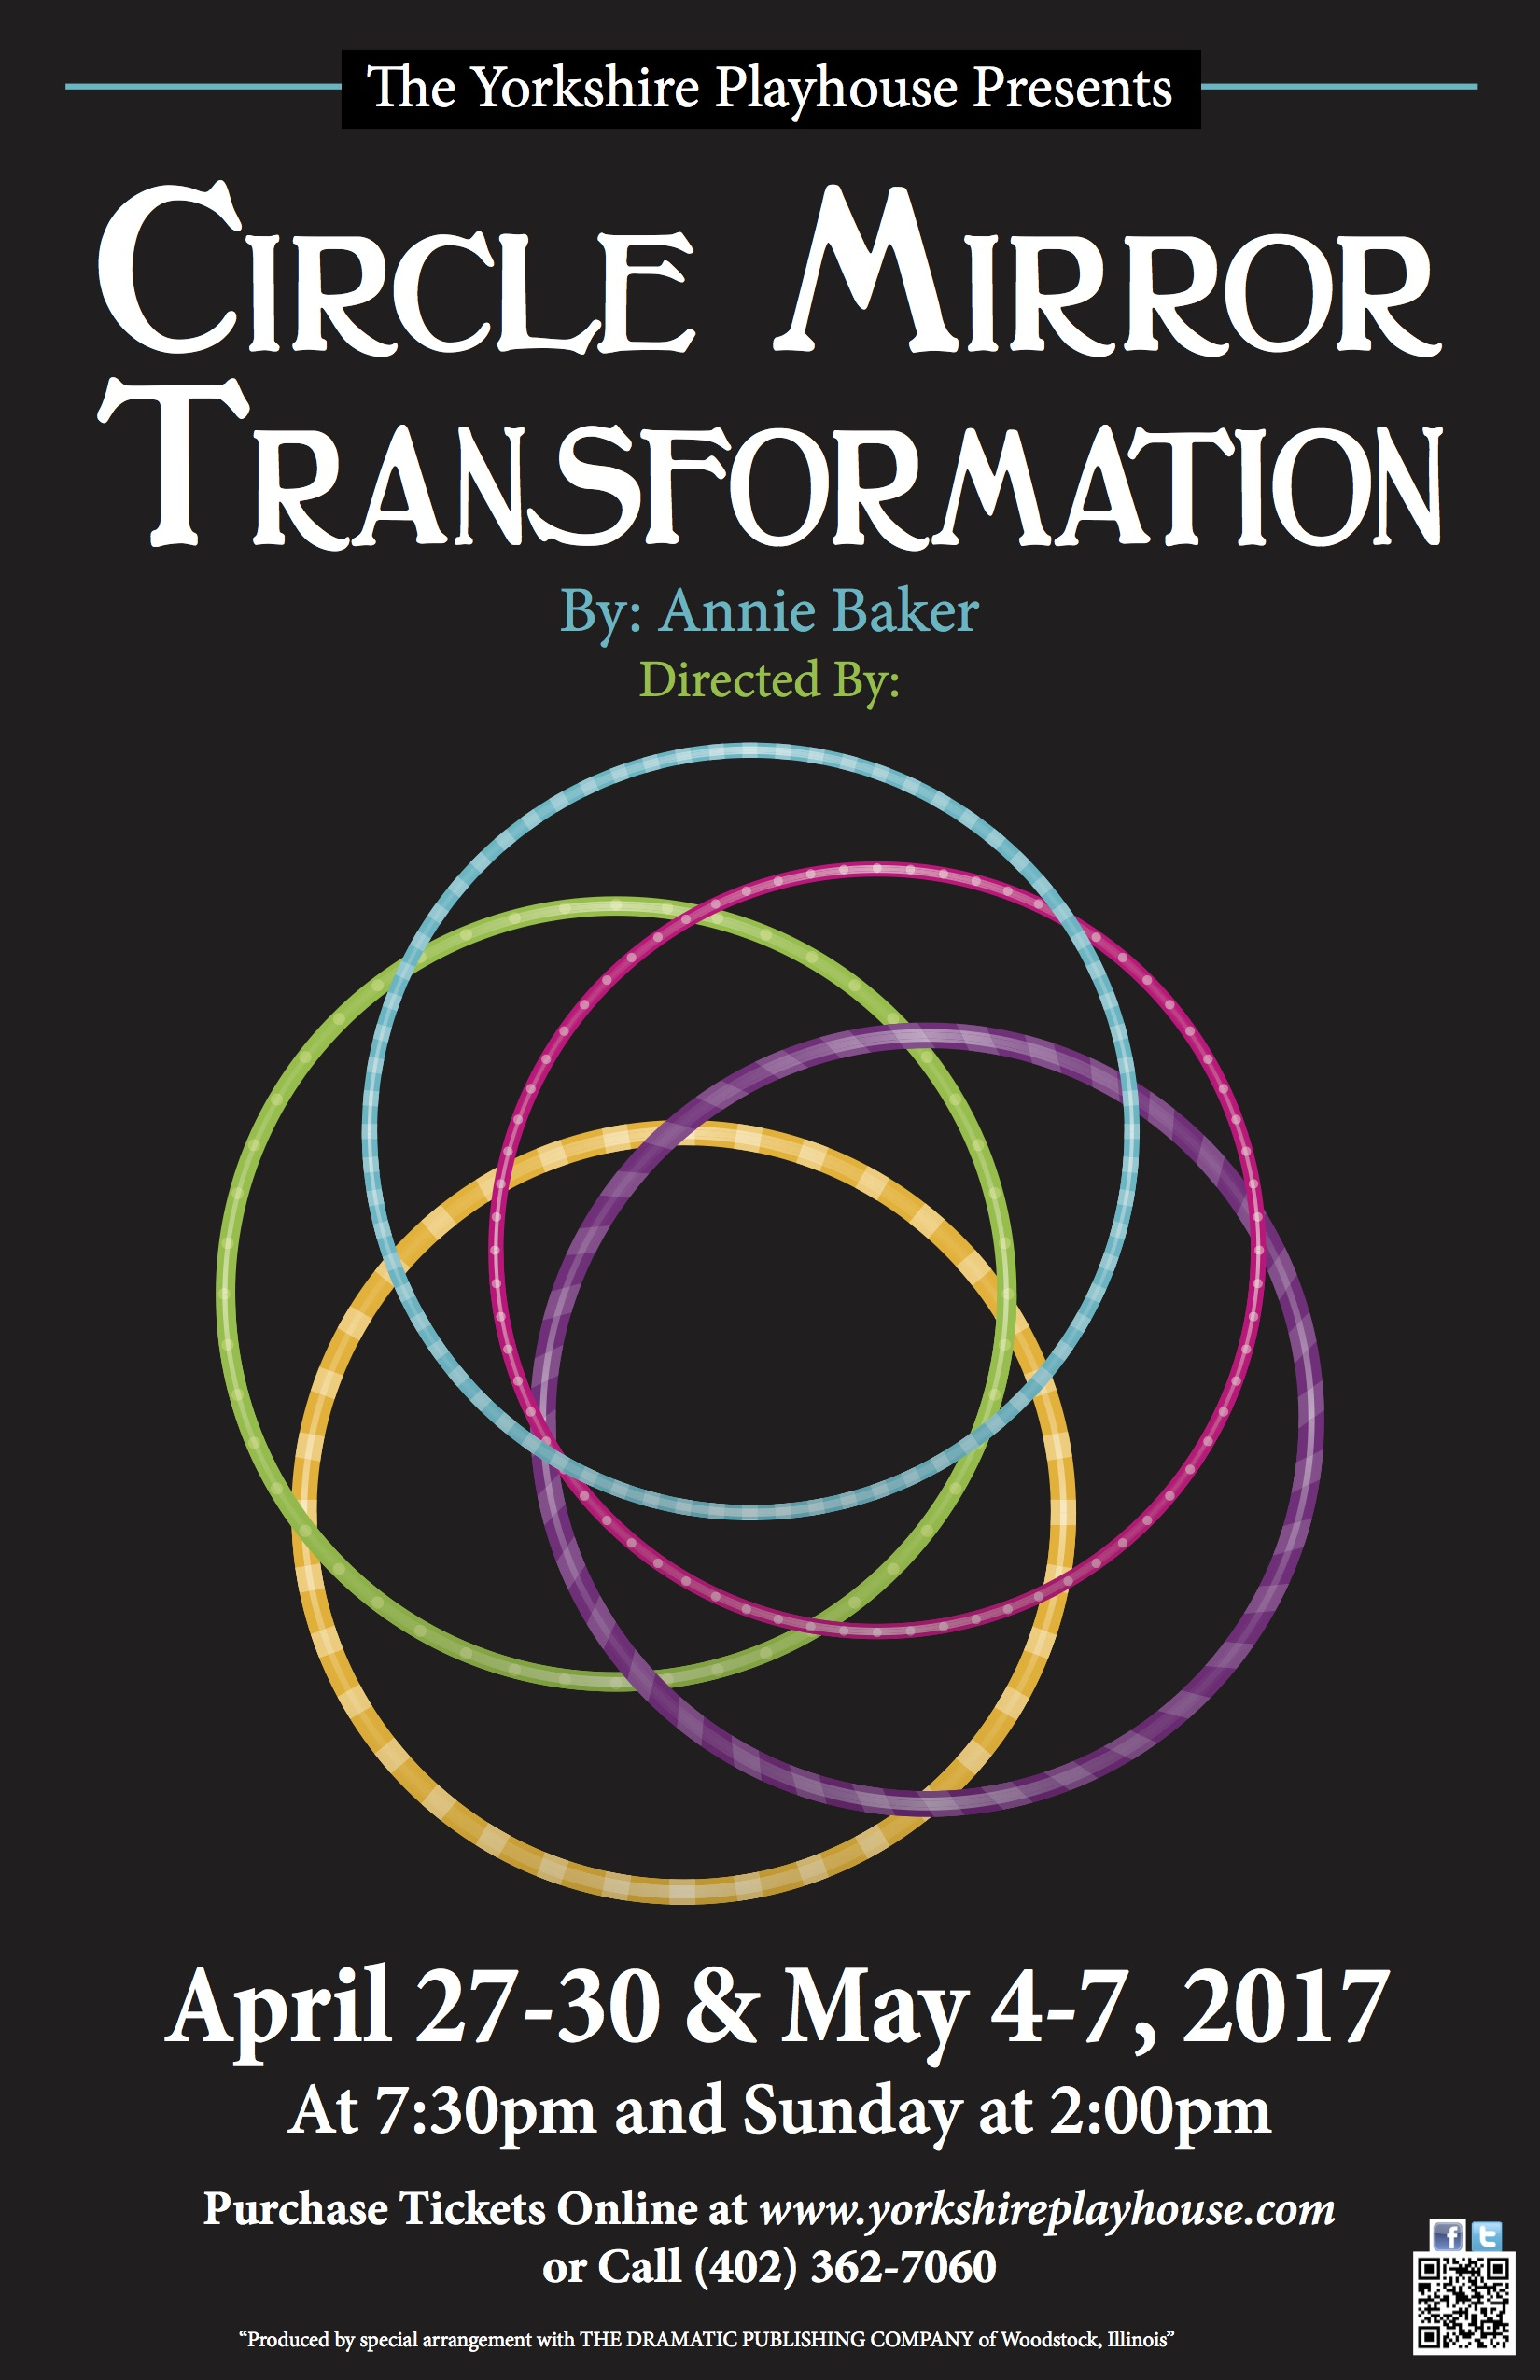 Circle, Mirror, Transformation -Poster- JPEG.jpg